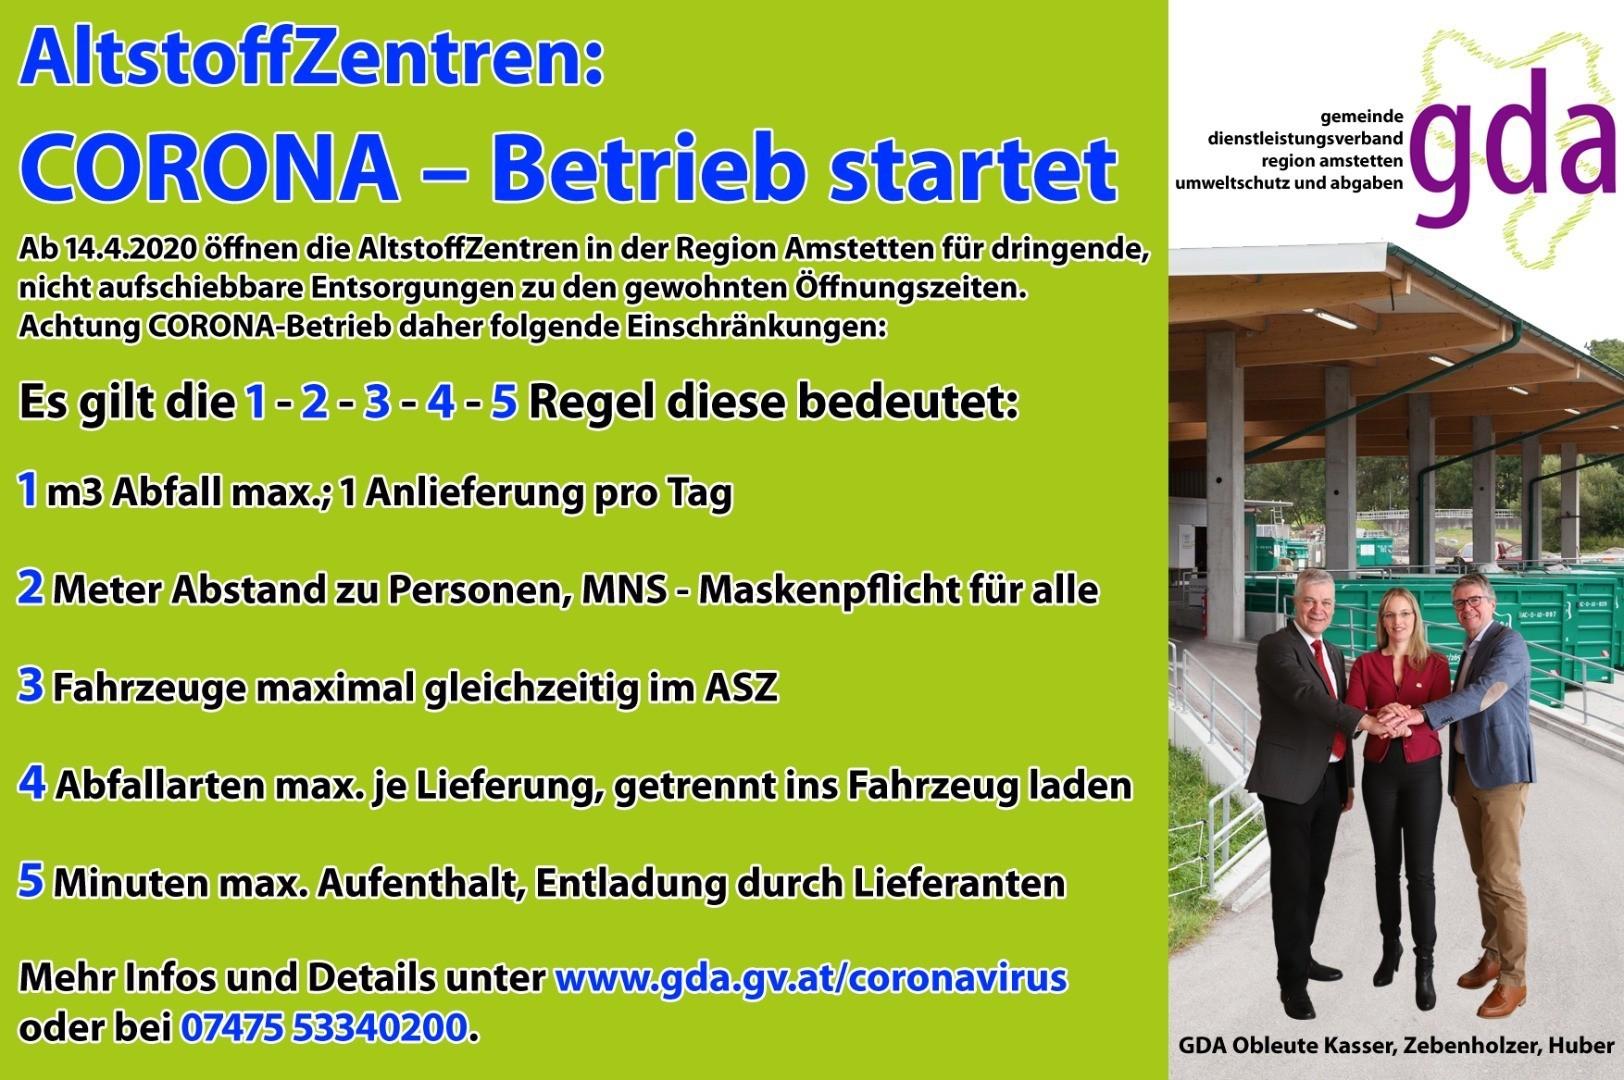 ASZ_Coronabetrieb_98x65.jpg